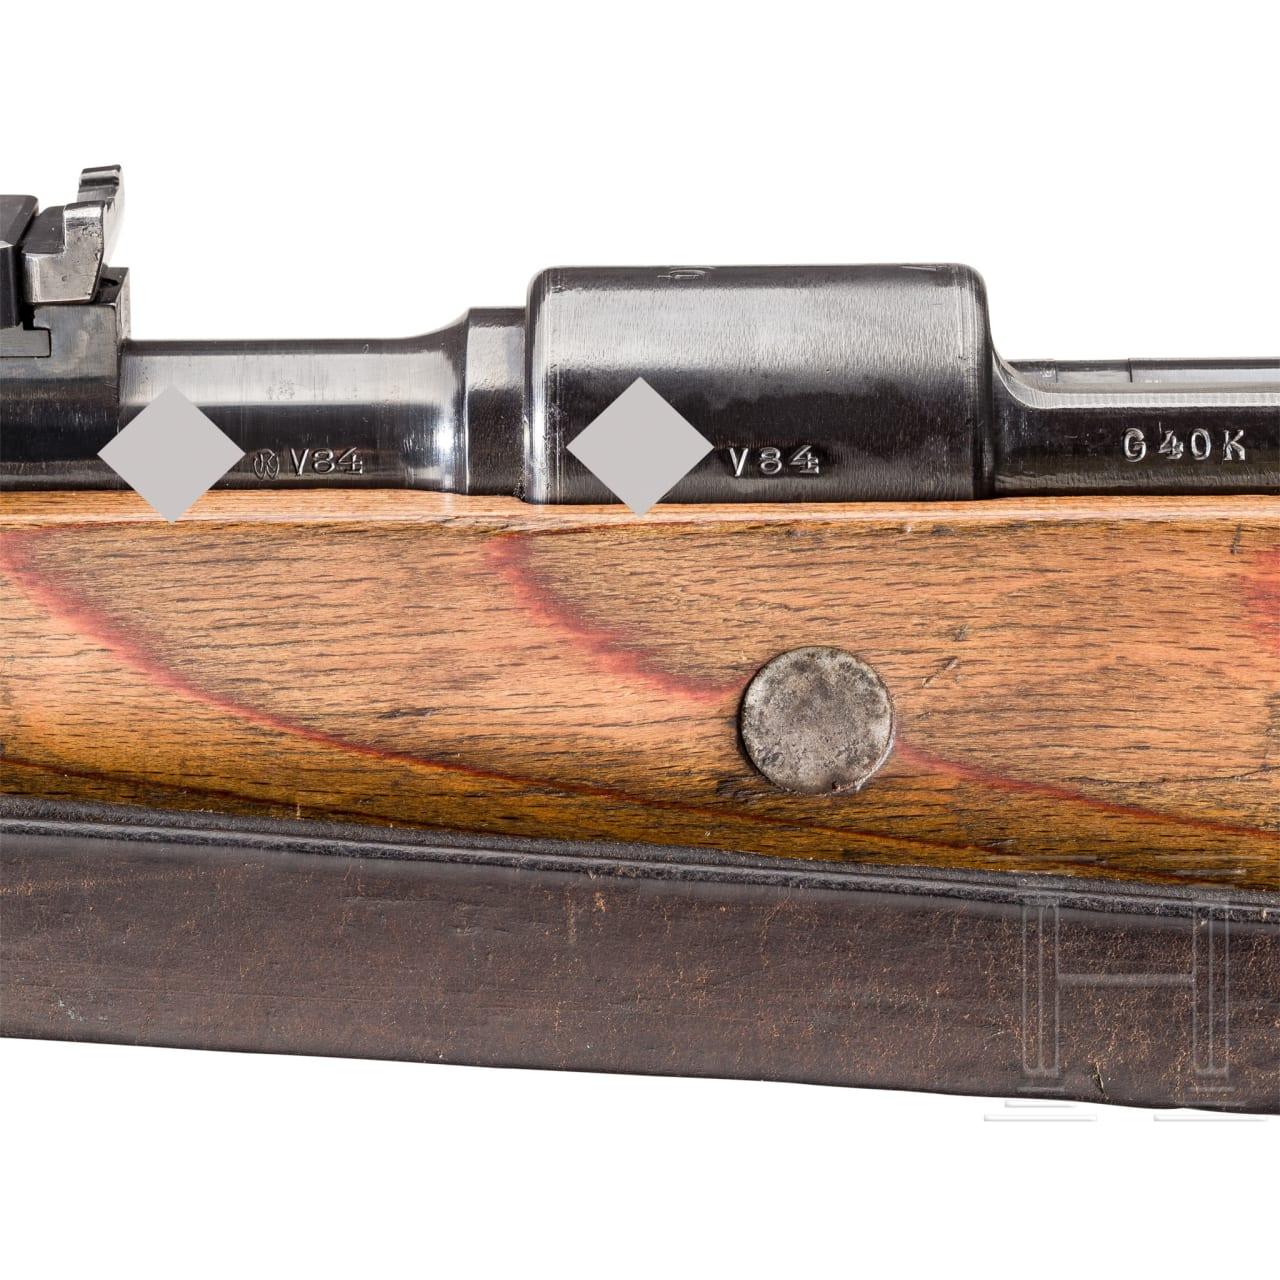 "A Karabiner G 40 k, Code ""byf - 41"", shortened experimental version of the K 98k"